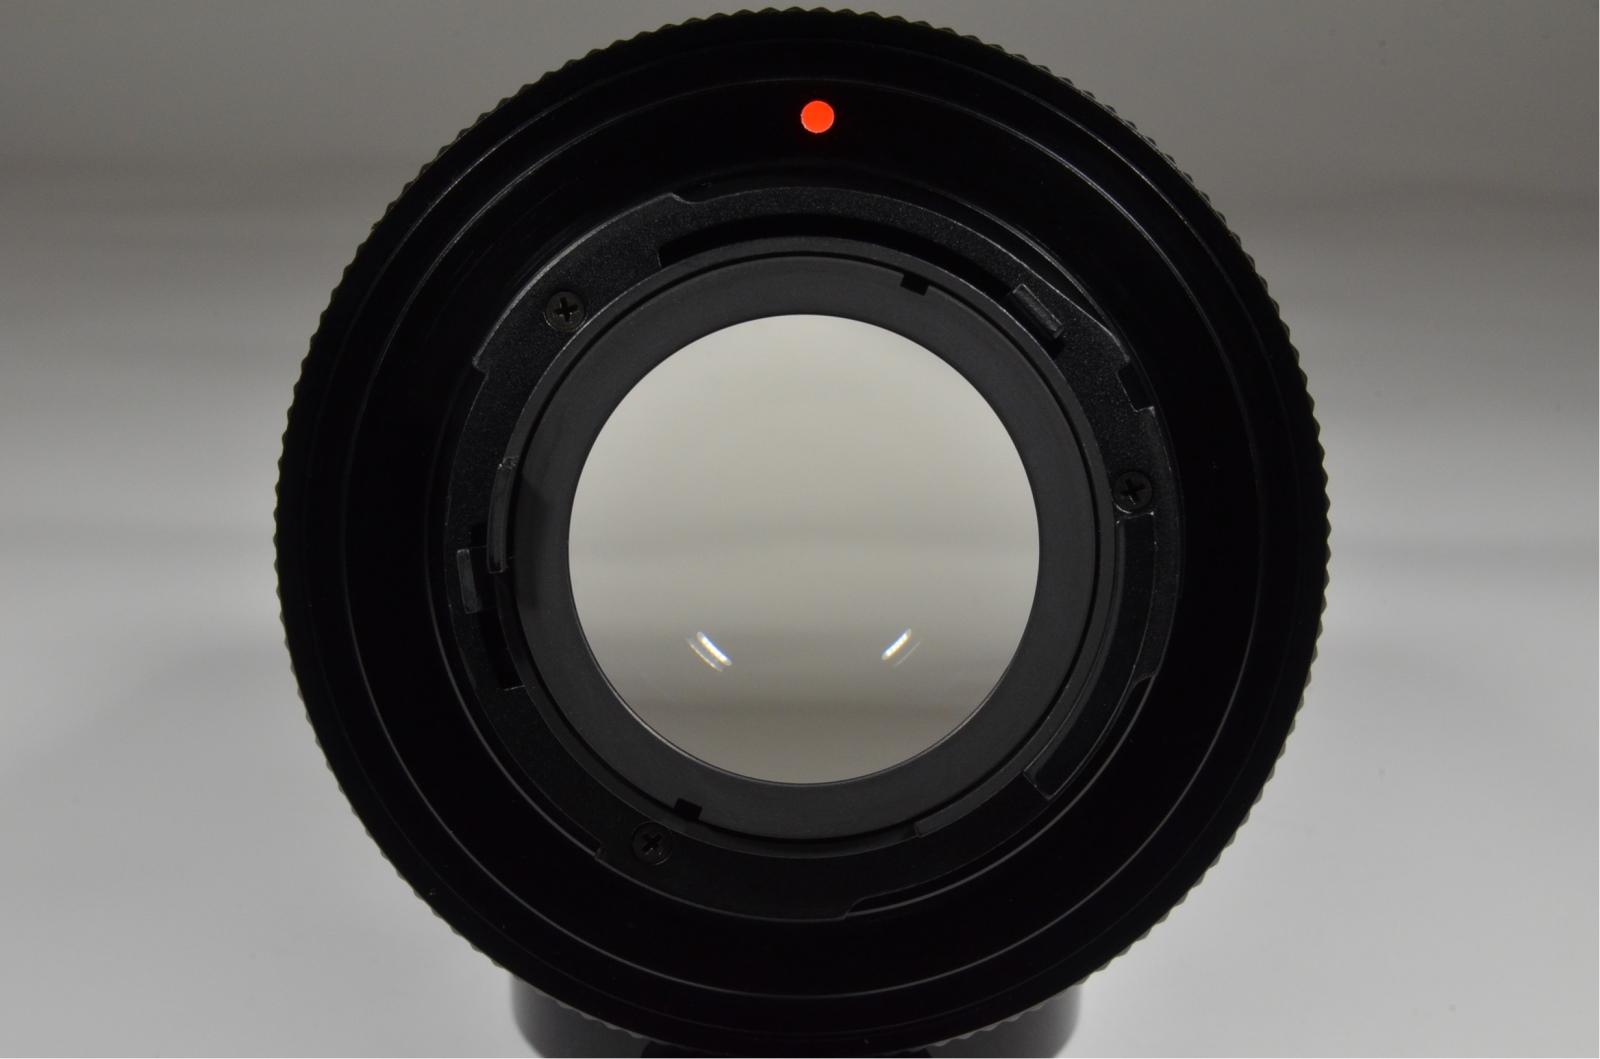 contax carl zeiss distagon t* 35mm f1.4 aeg germany